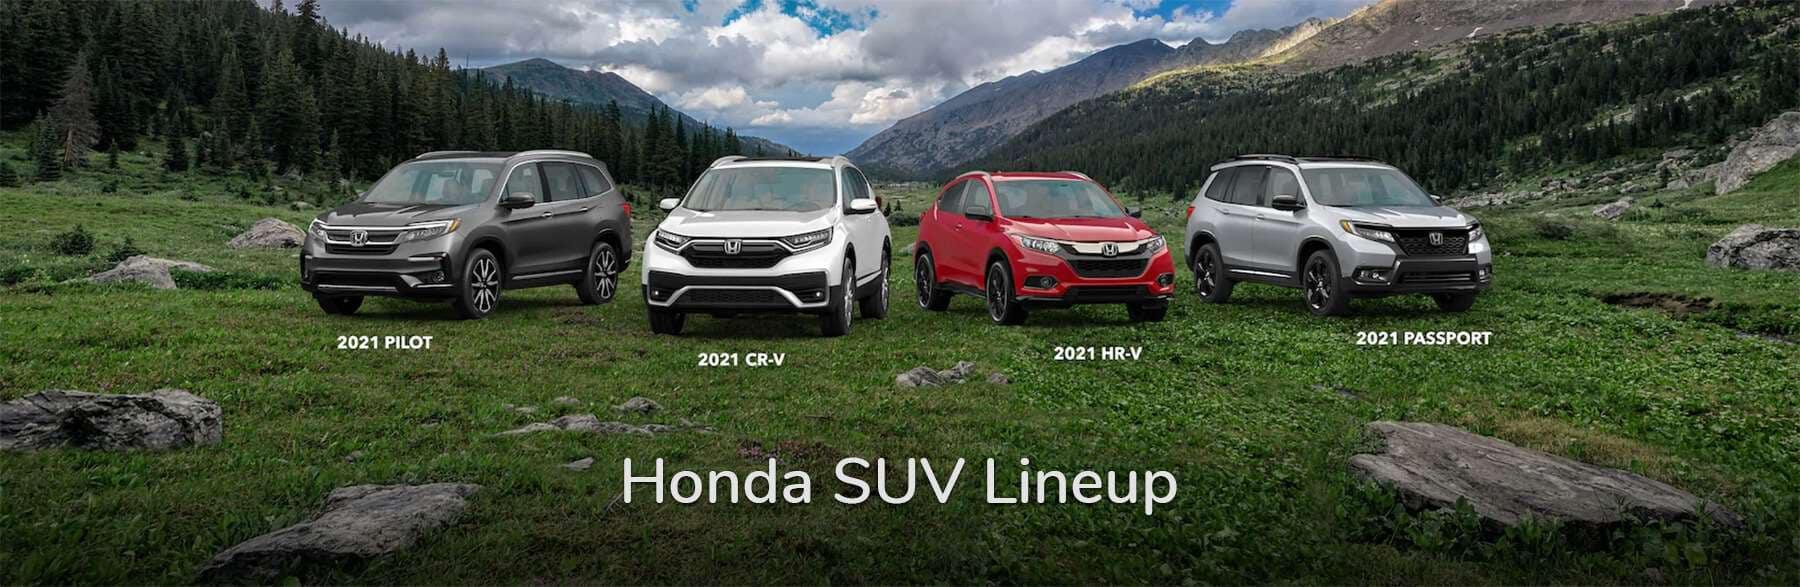 Honda SUV Lineup Vern Eide Honda Slider